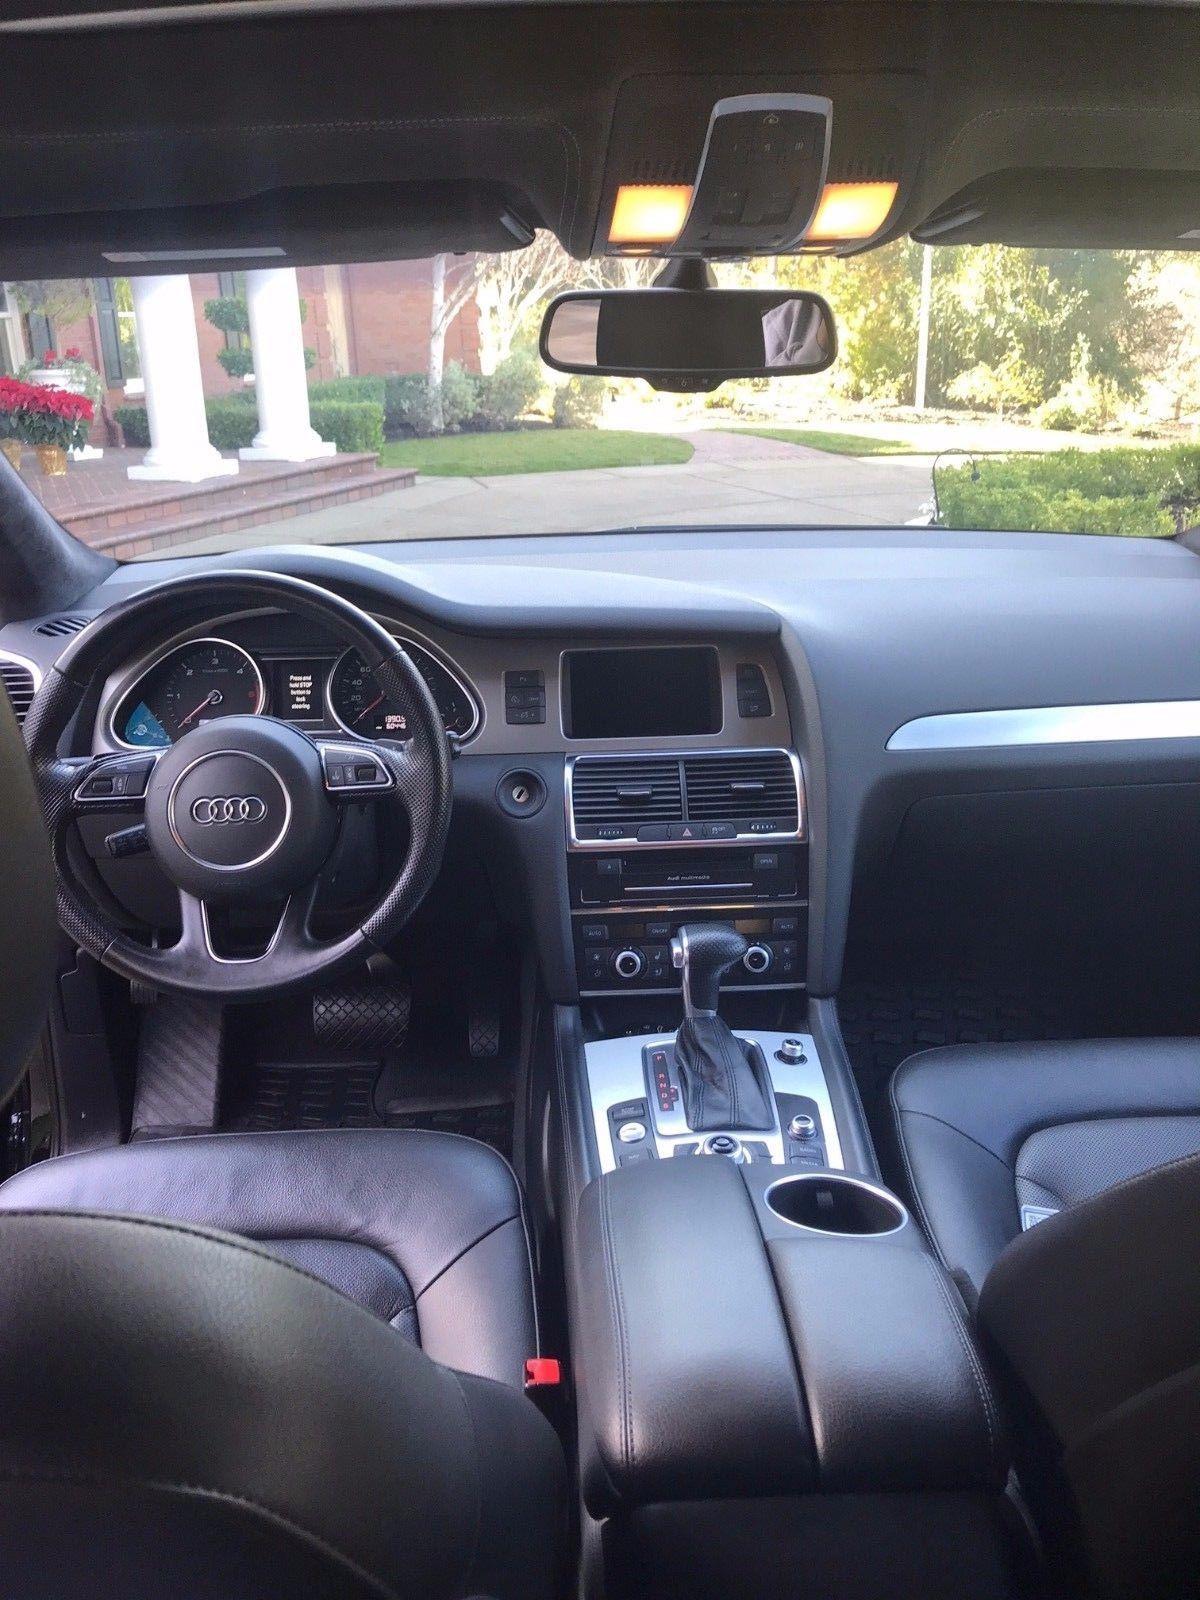 Awesomeamazinggreat Audi Q Luxury Fully Loaded Audi Q Tdi Quattro Tiptronic Prestige Model